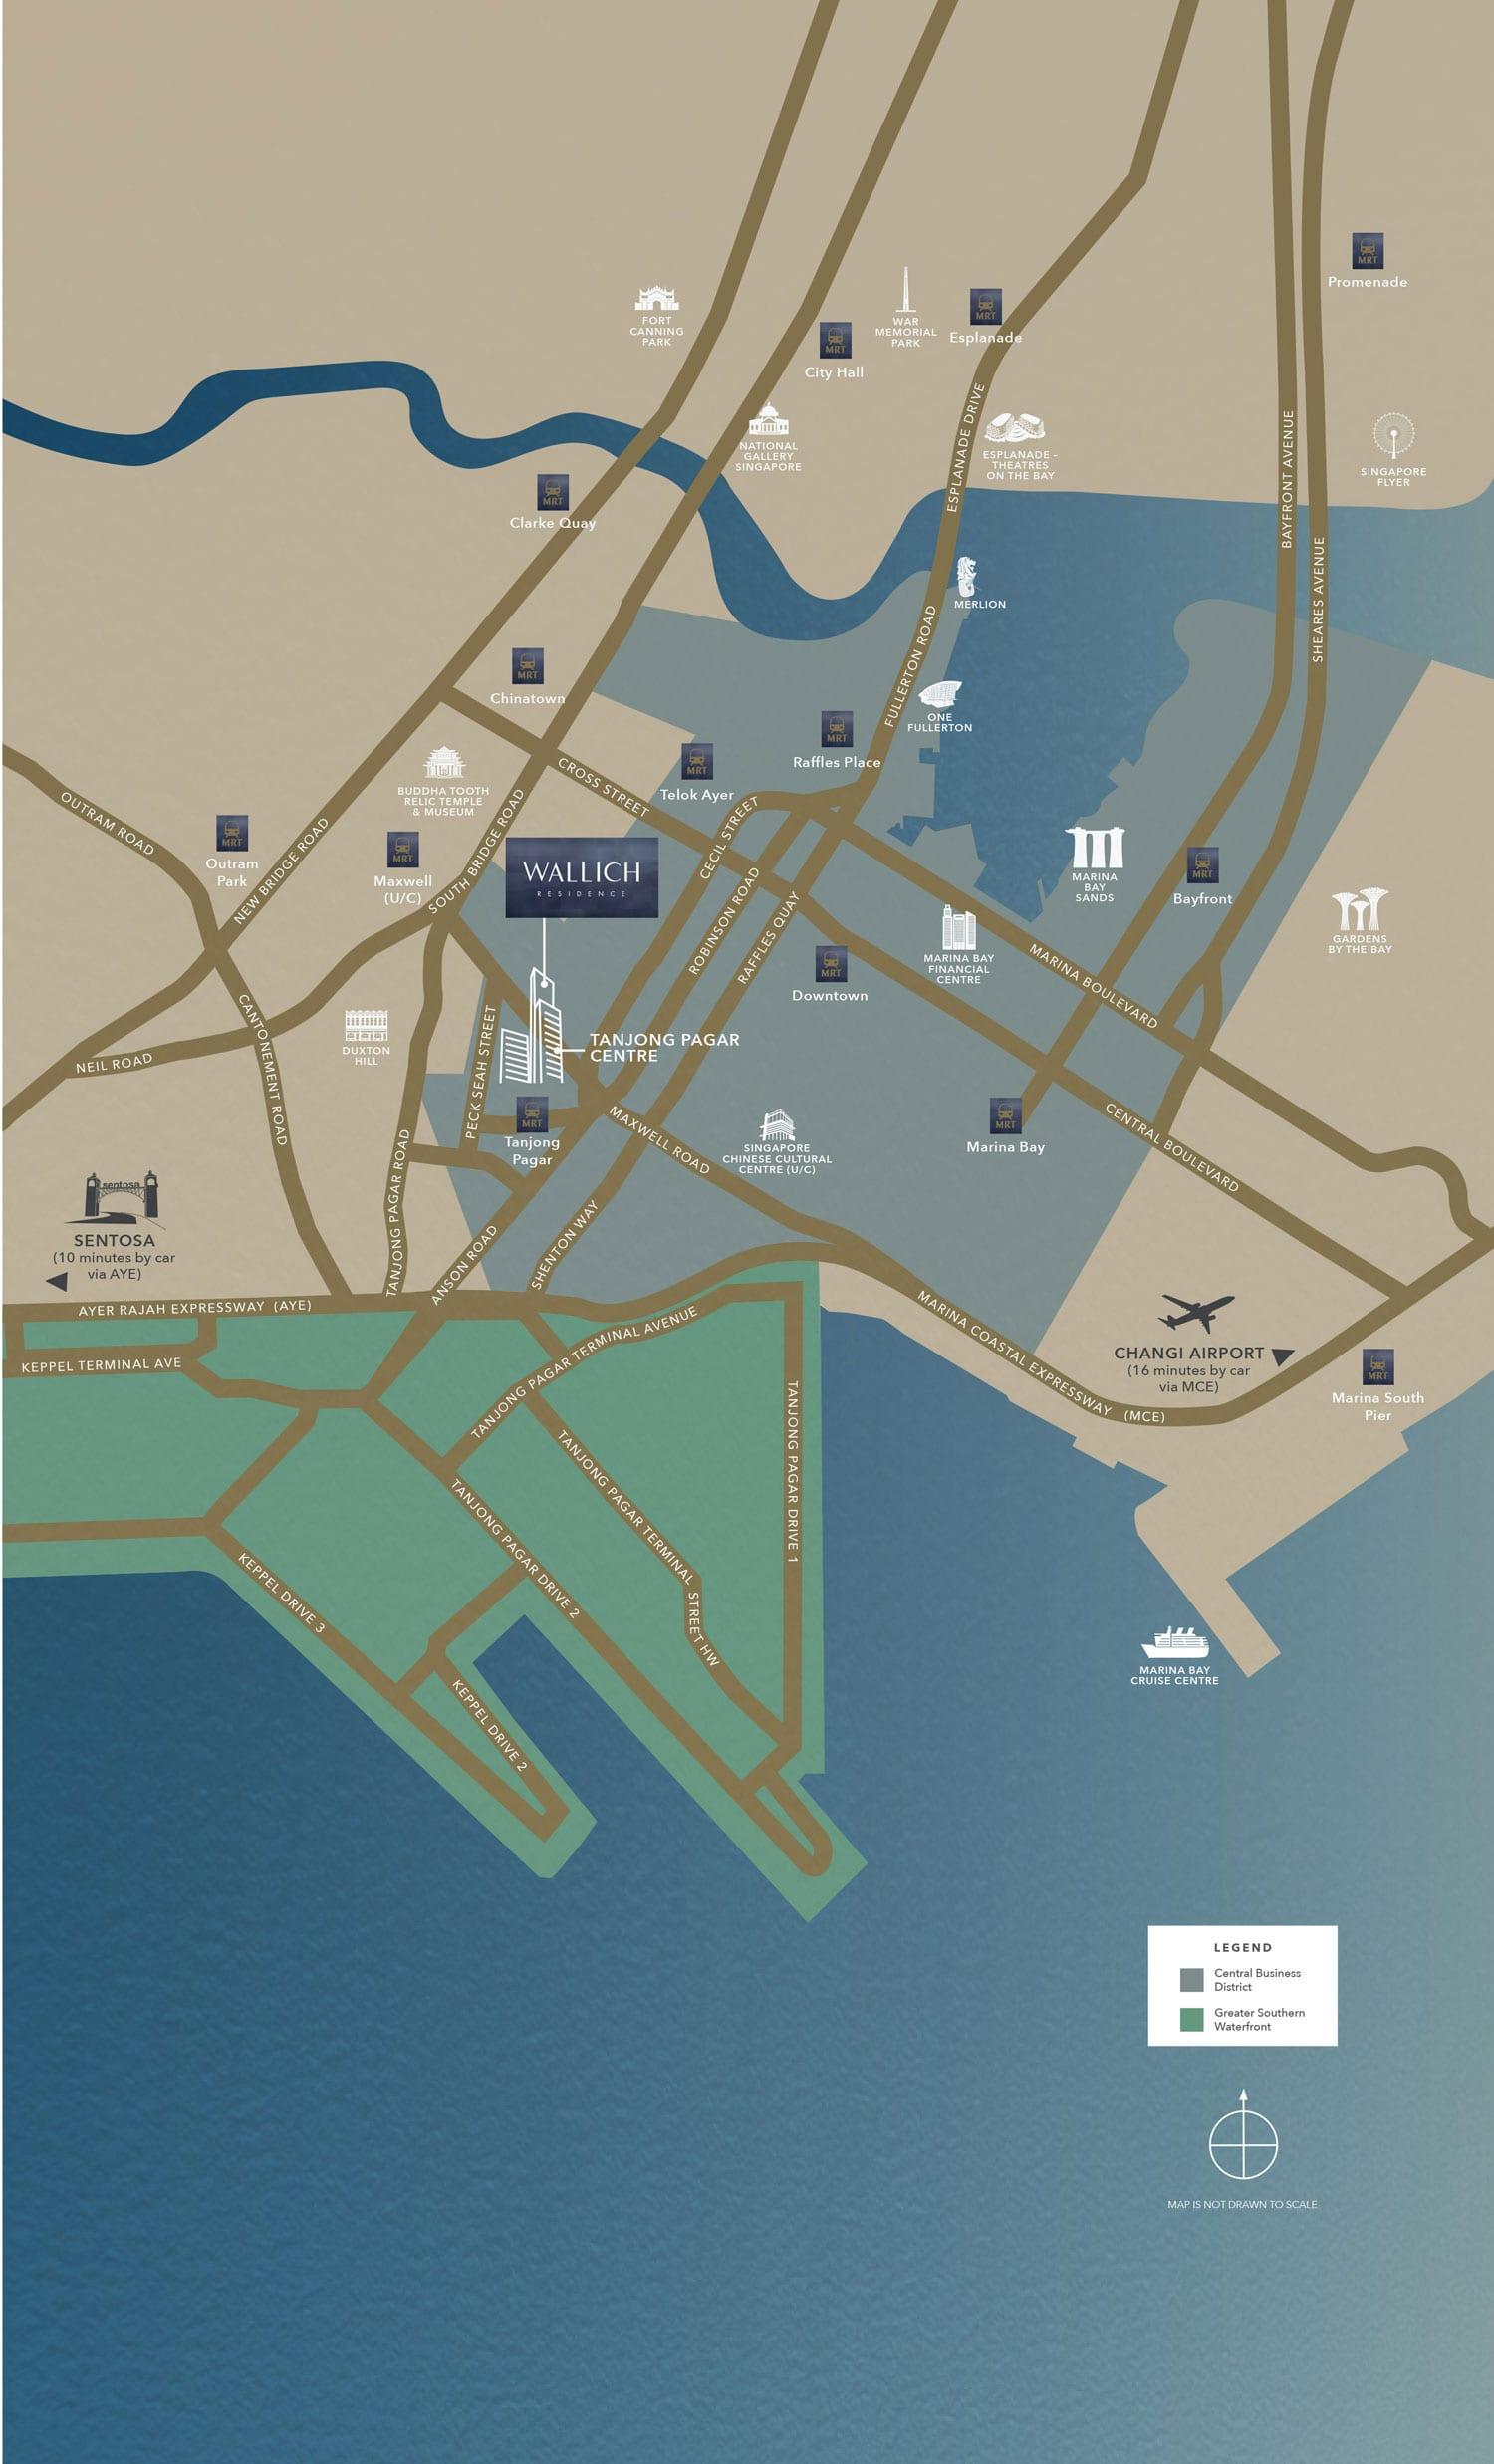 Wallich Residence Location Map | SG Tallest Luxury Condo